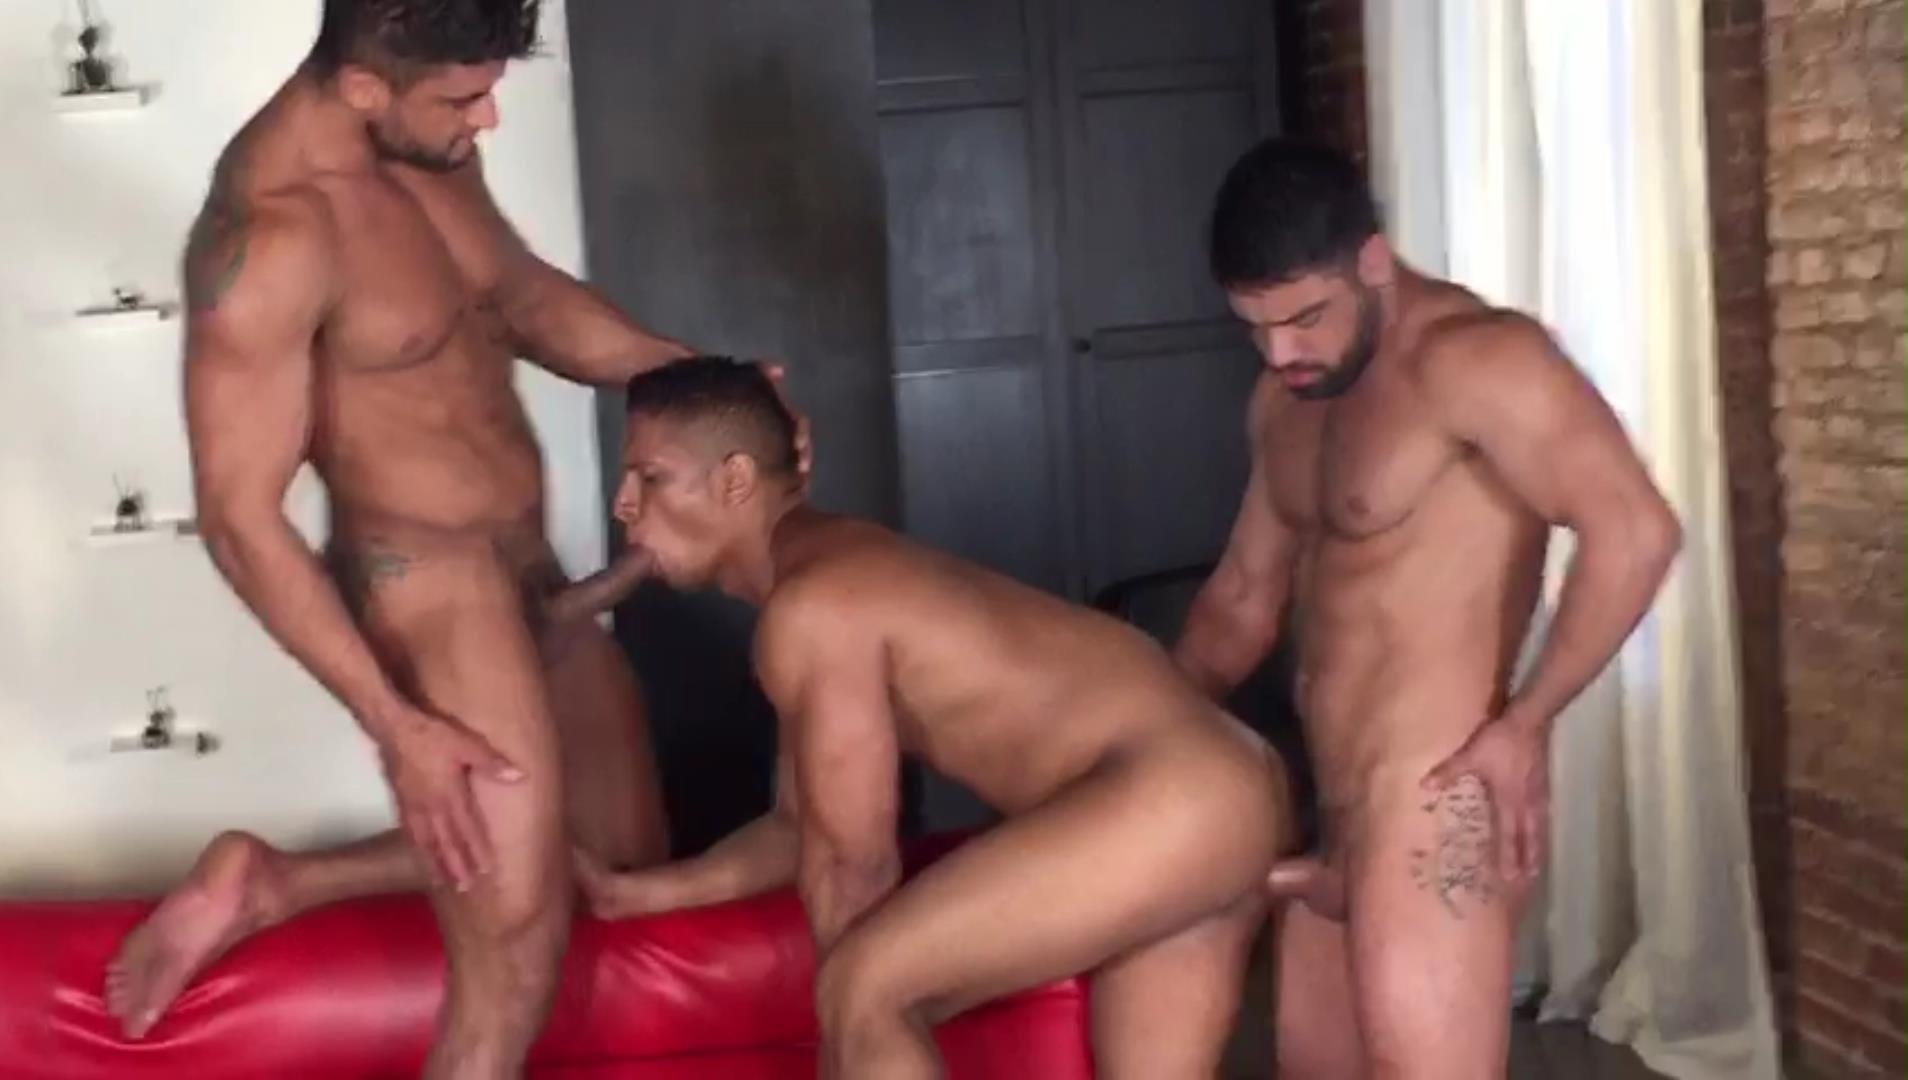 Adrian Spanish Free Gay Porn Video behind the scenes: diego lauzen, wagner vittoria, adrian